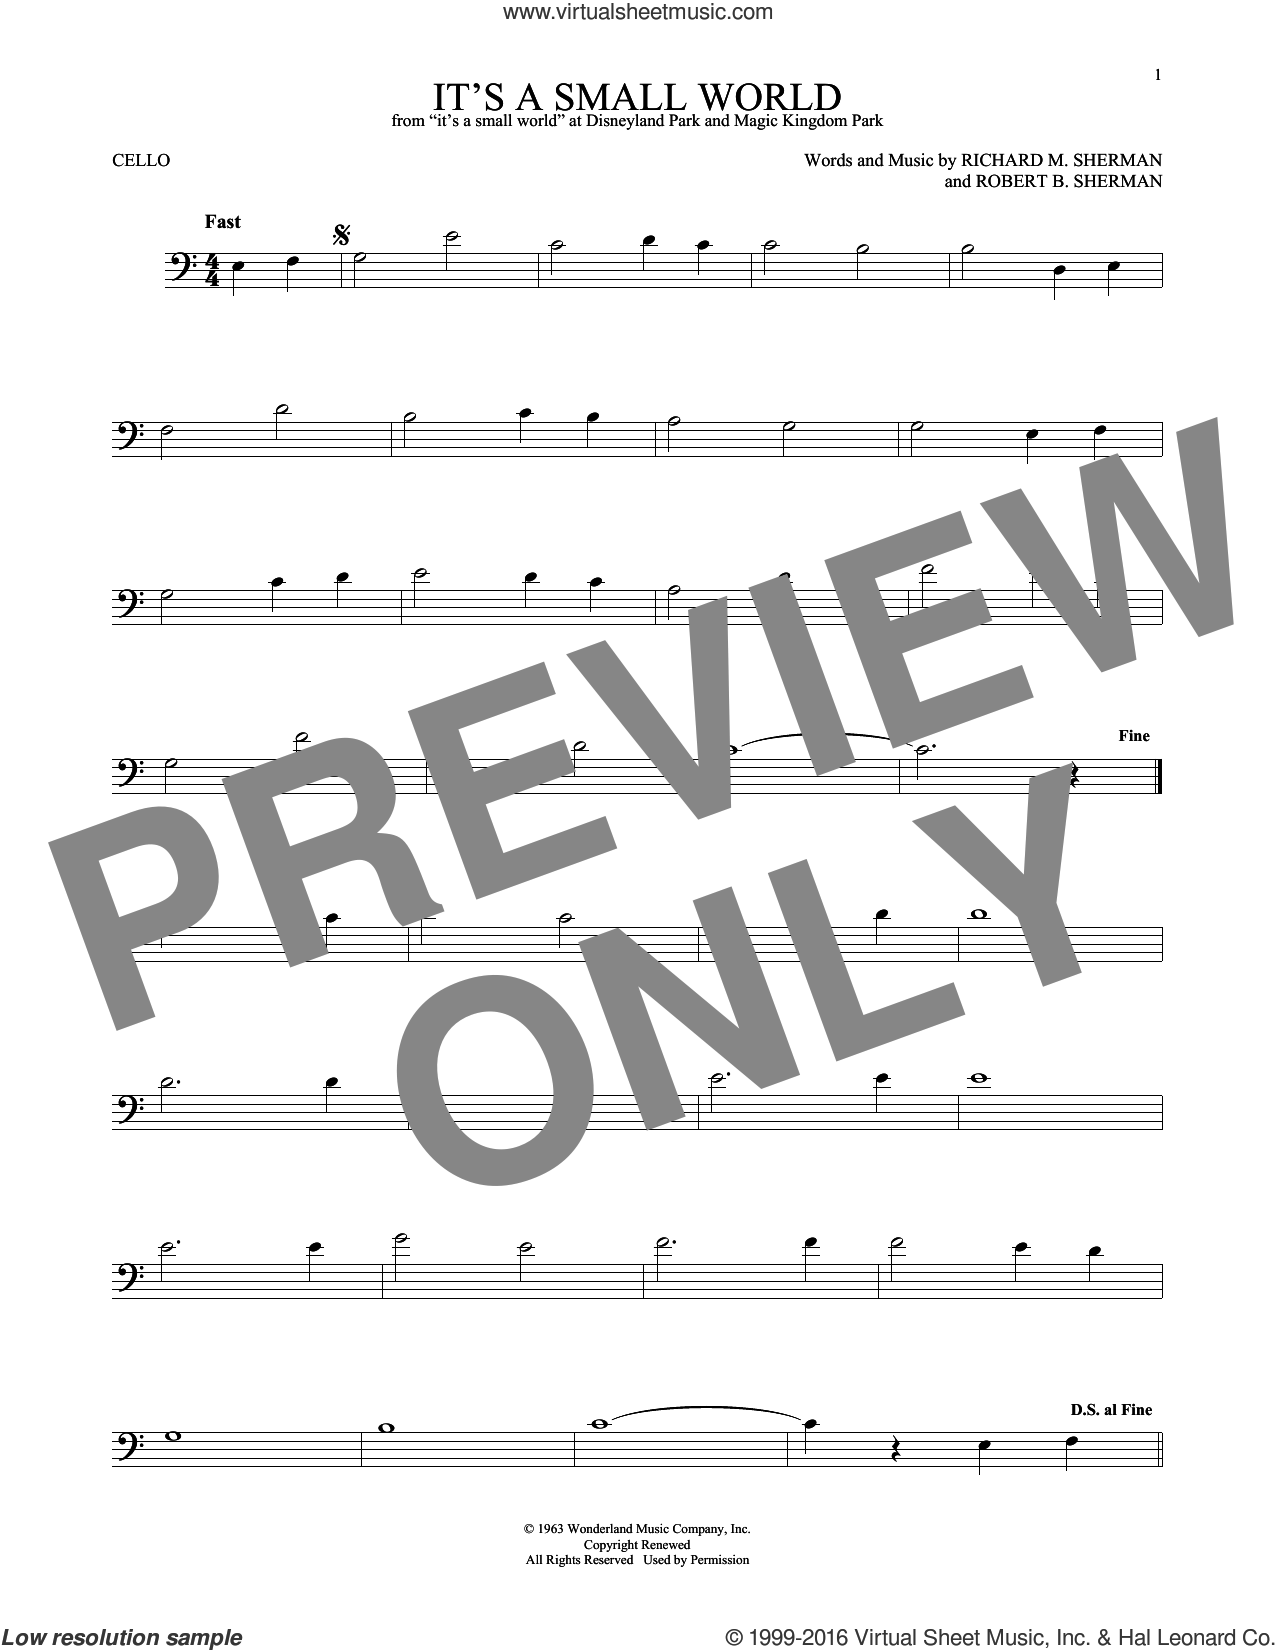 It's A Small World sheet music for cello solo by Richard & Robert Sherman, Richard M. Sherman and Robert B. Sherman, intermediate skill level